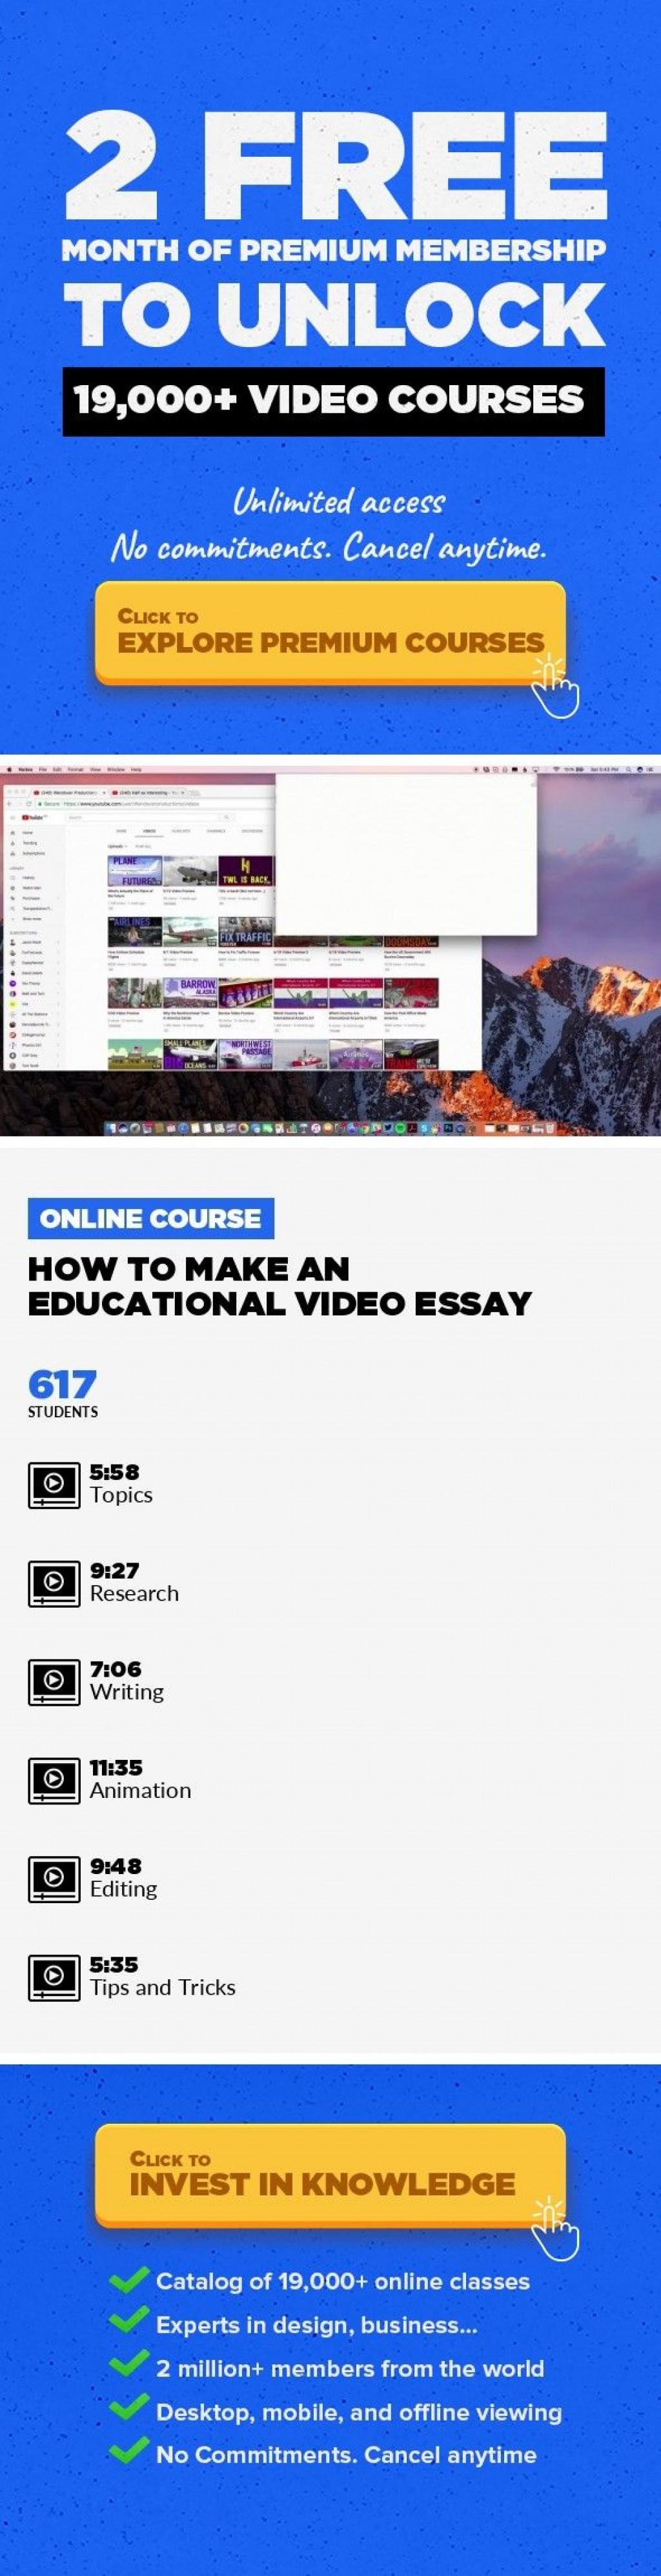 010 How To Make Video Essay Wonderful A Create Photo Using Imovie Large